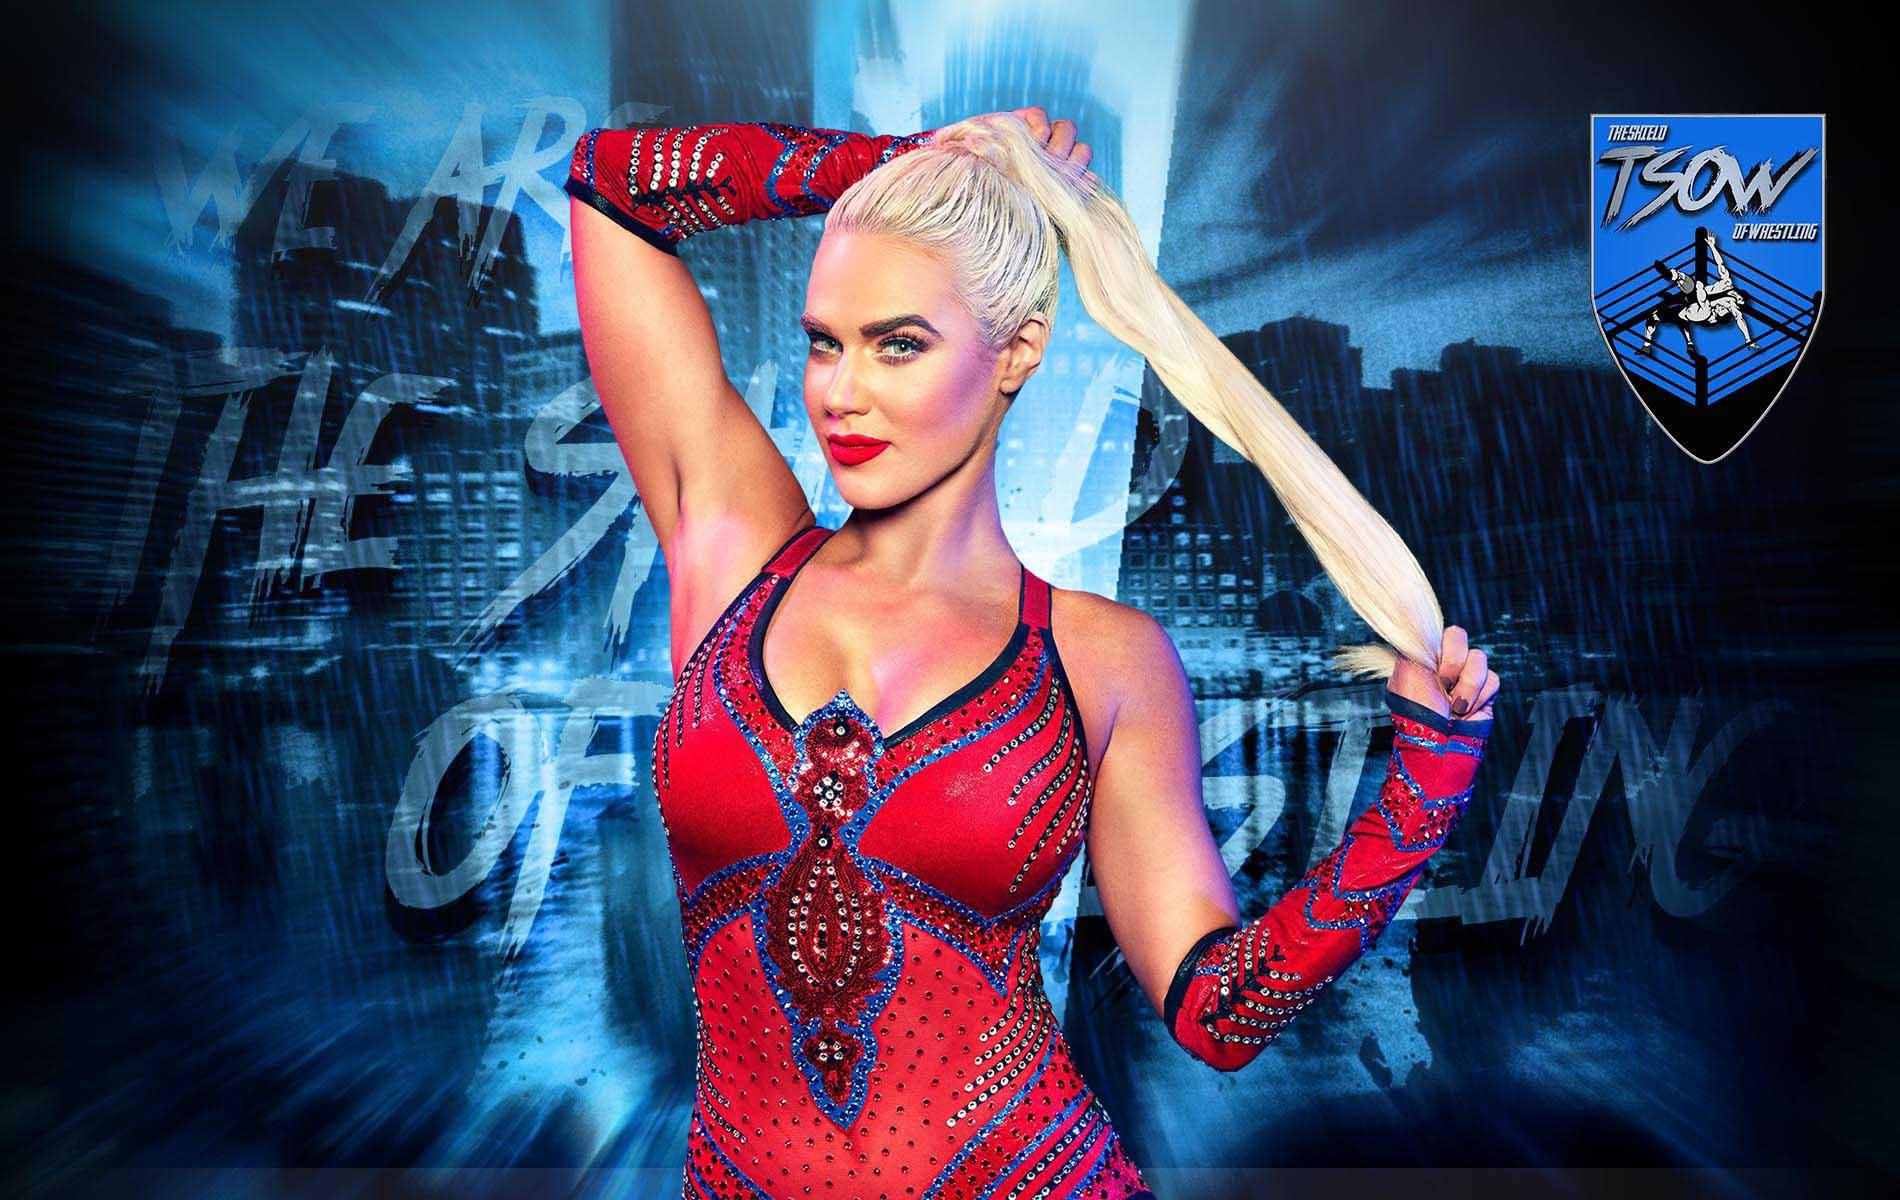 Lana tornerà a WWE Royal Rumble 2021?